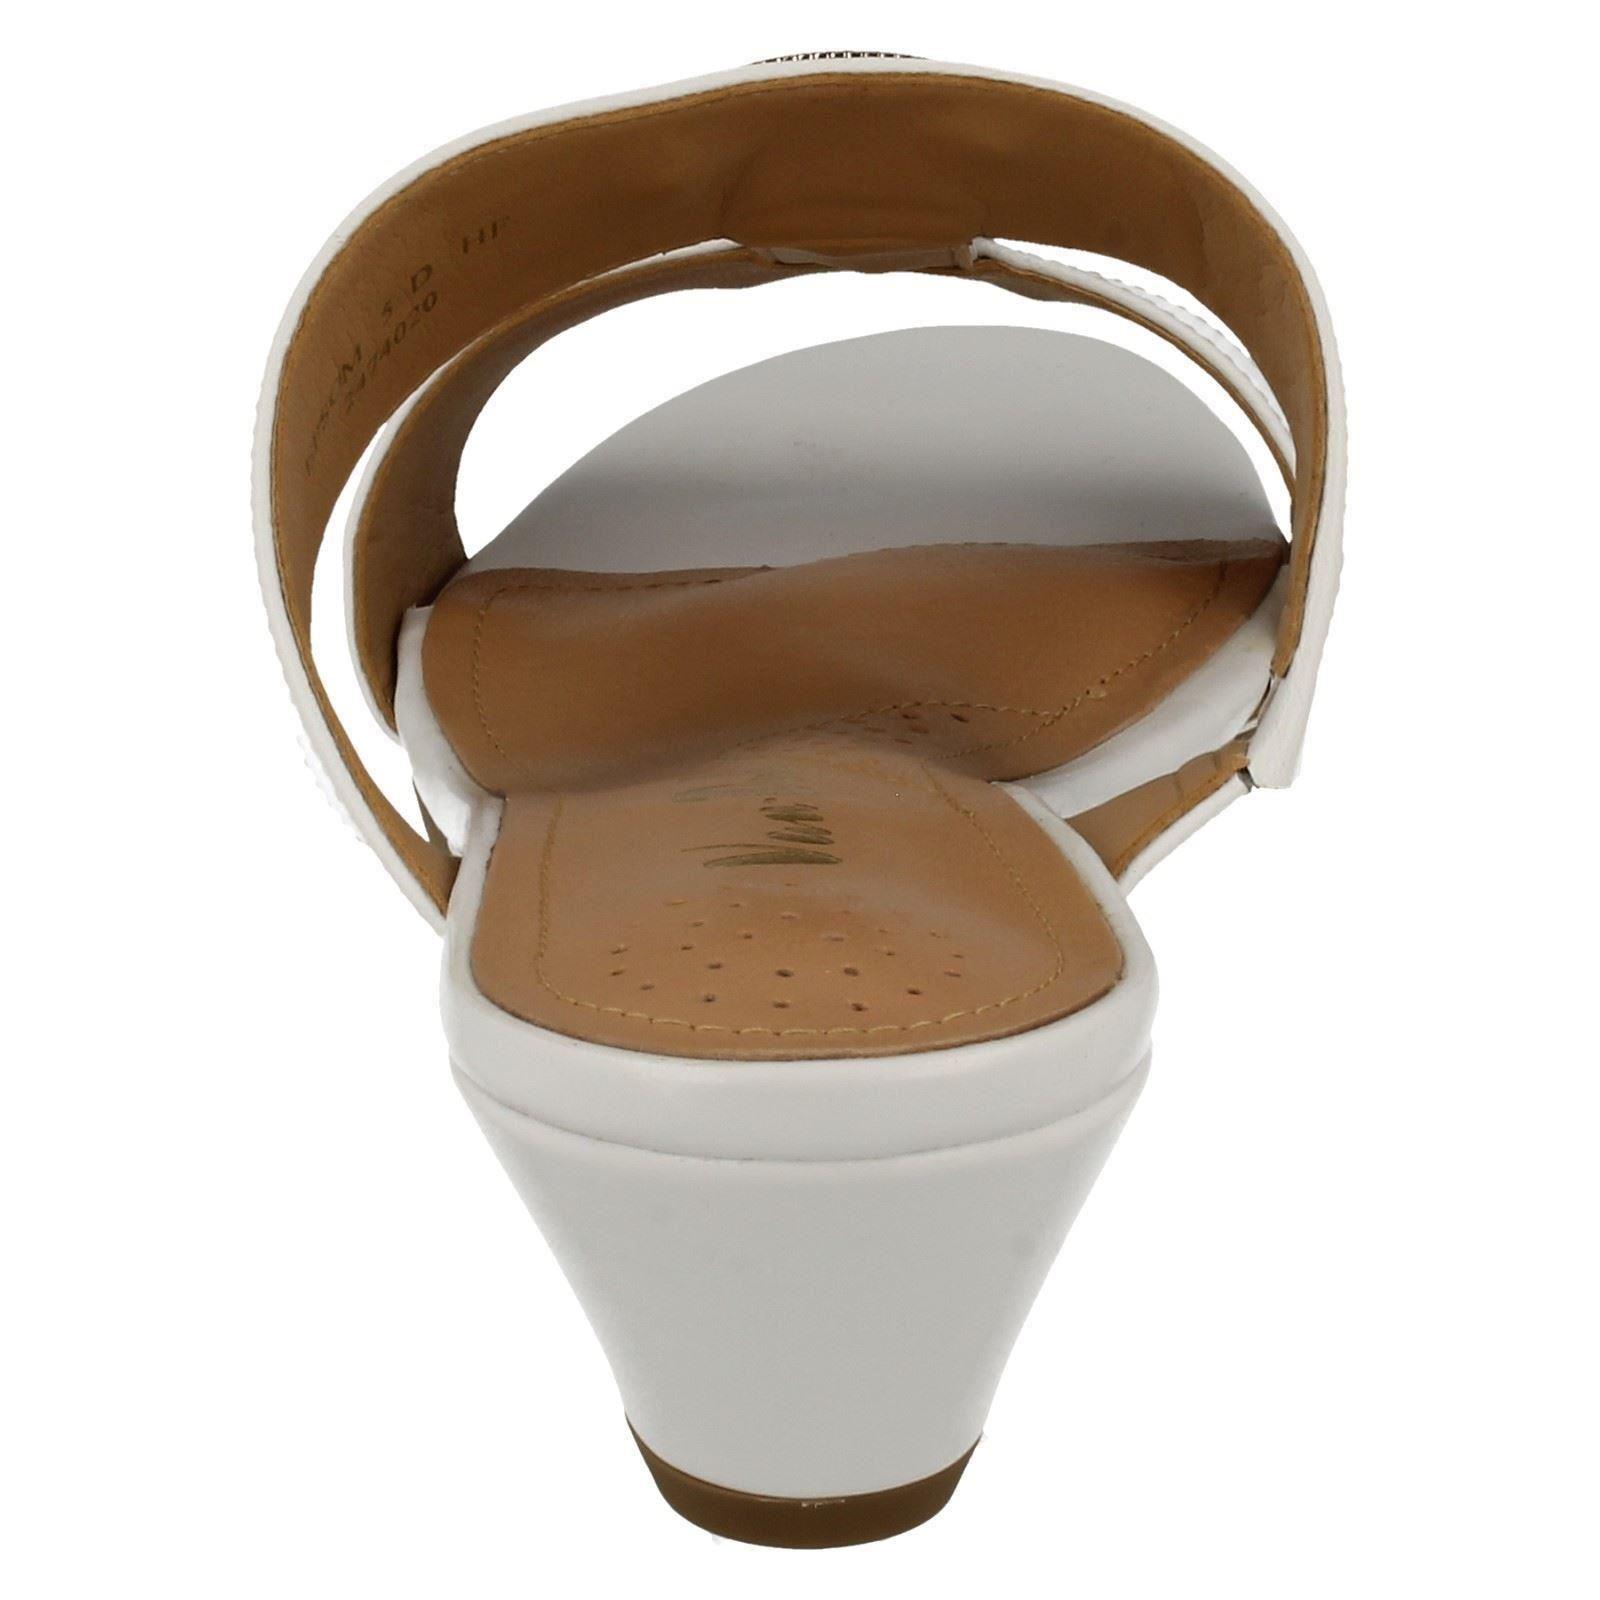 Ladies-Van-Dal-Open-Toe-Slip-On-Summer-Low-Wedge-Leather-Sandals-Epsom thumbnail 5